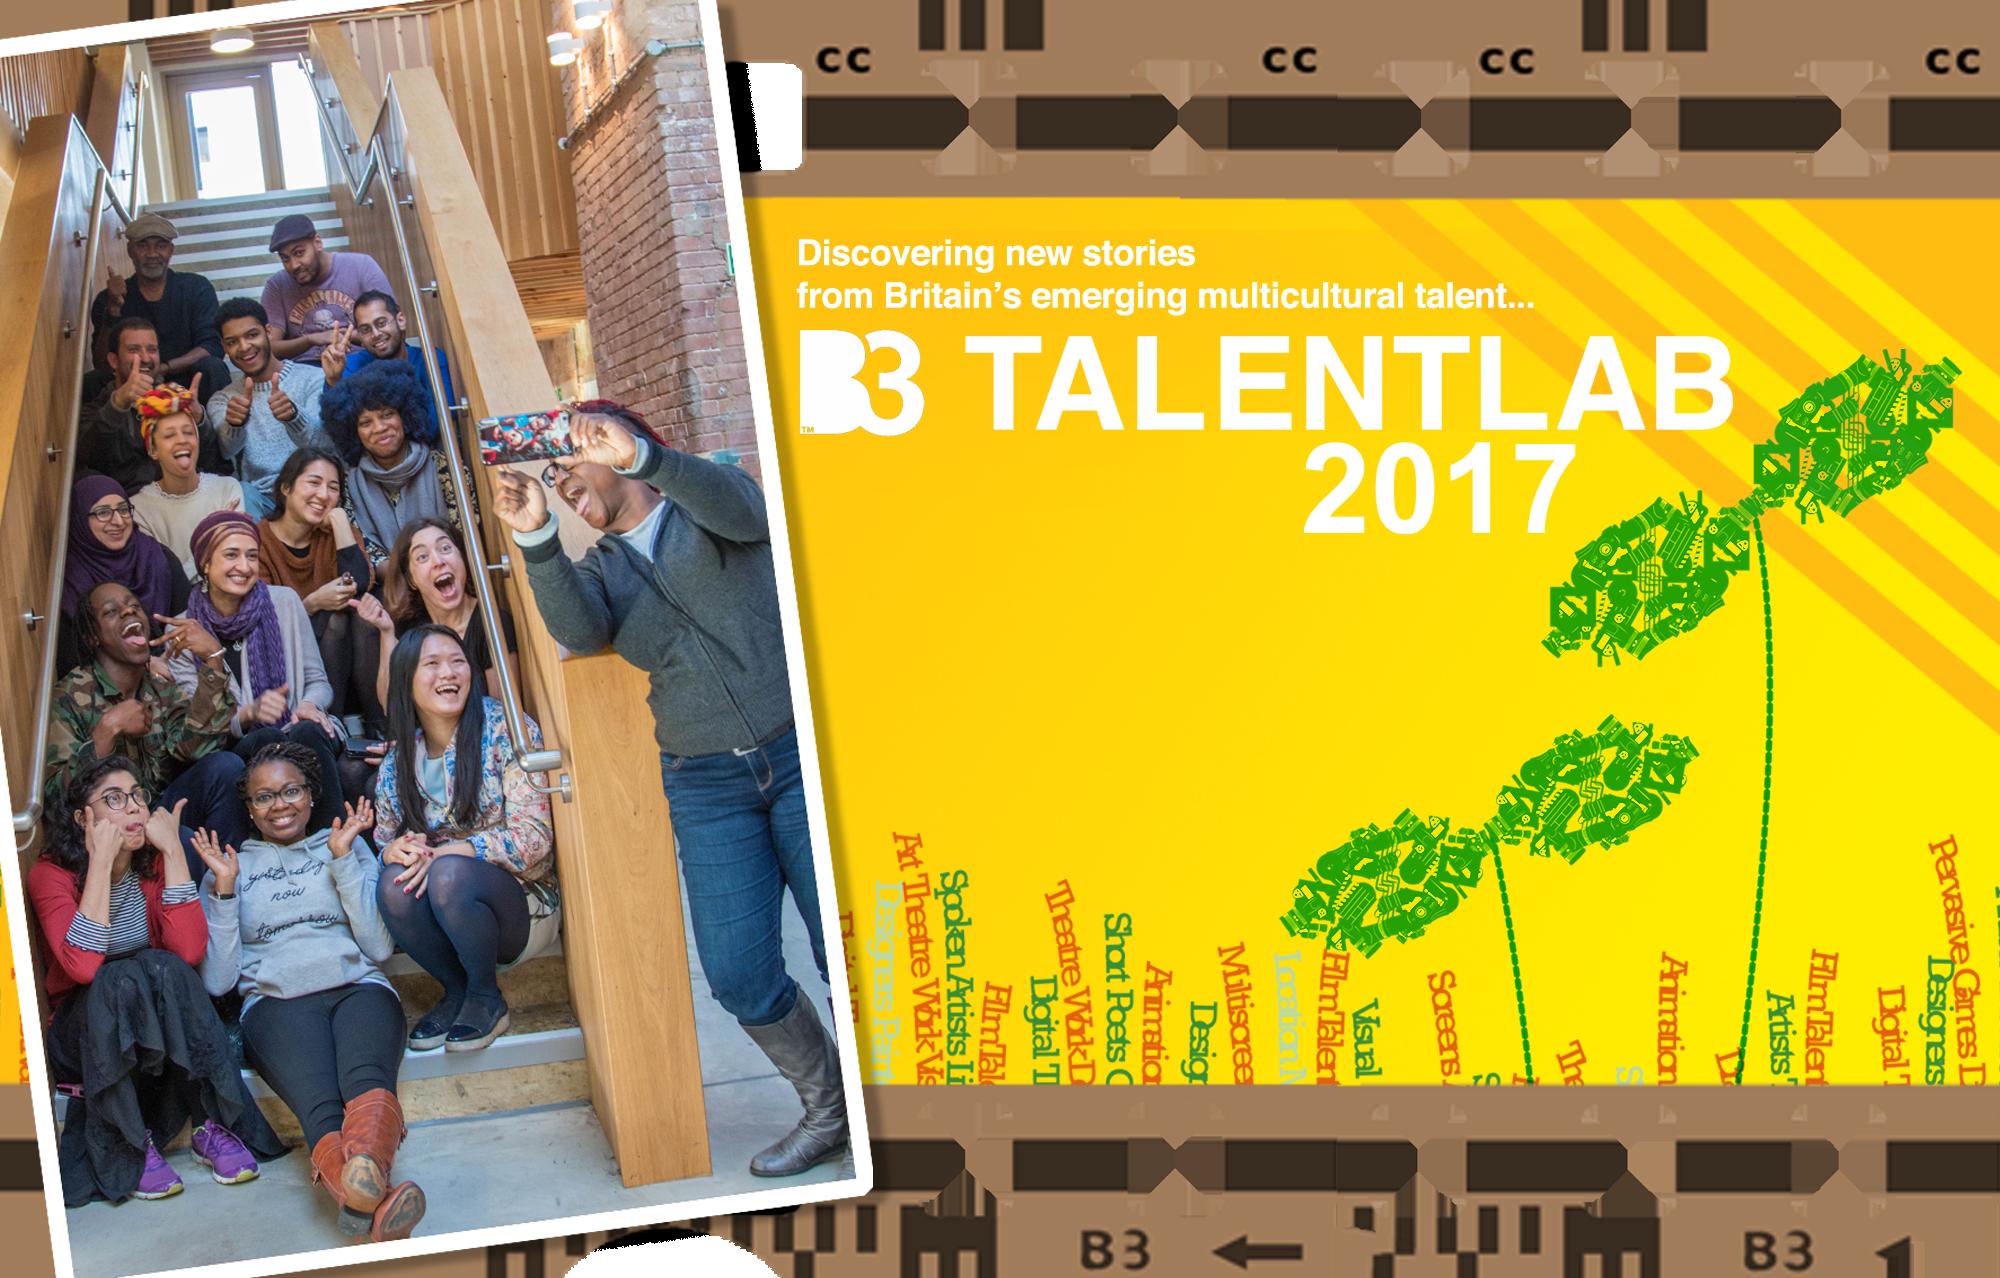 talentlab update banner.png